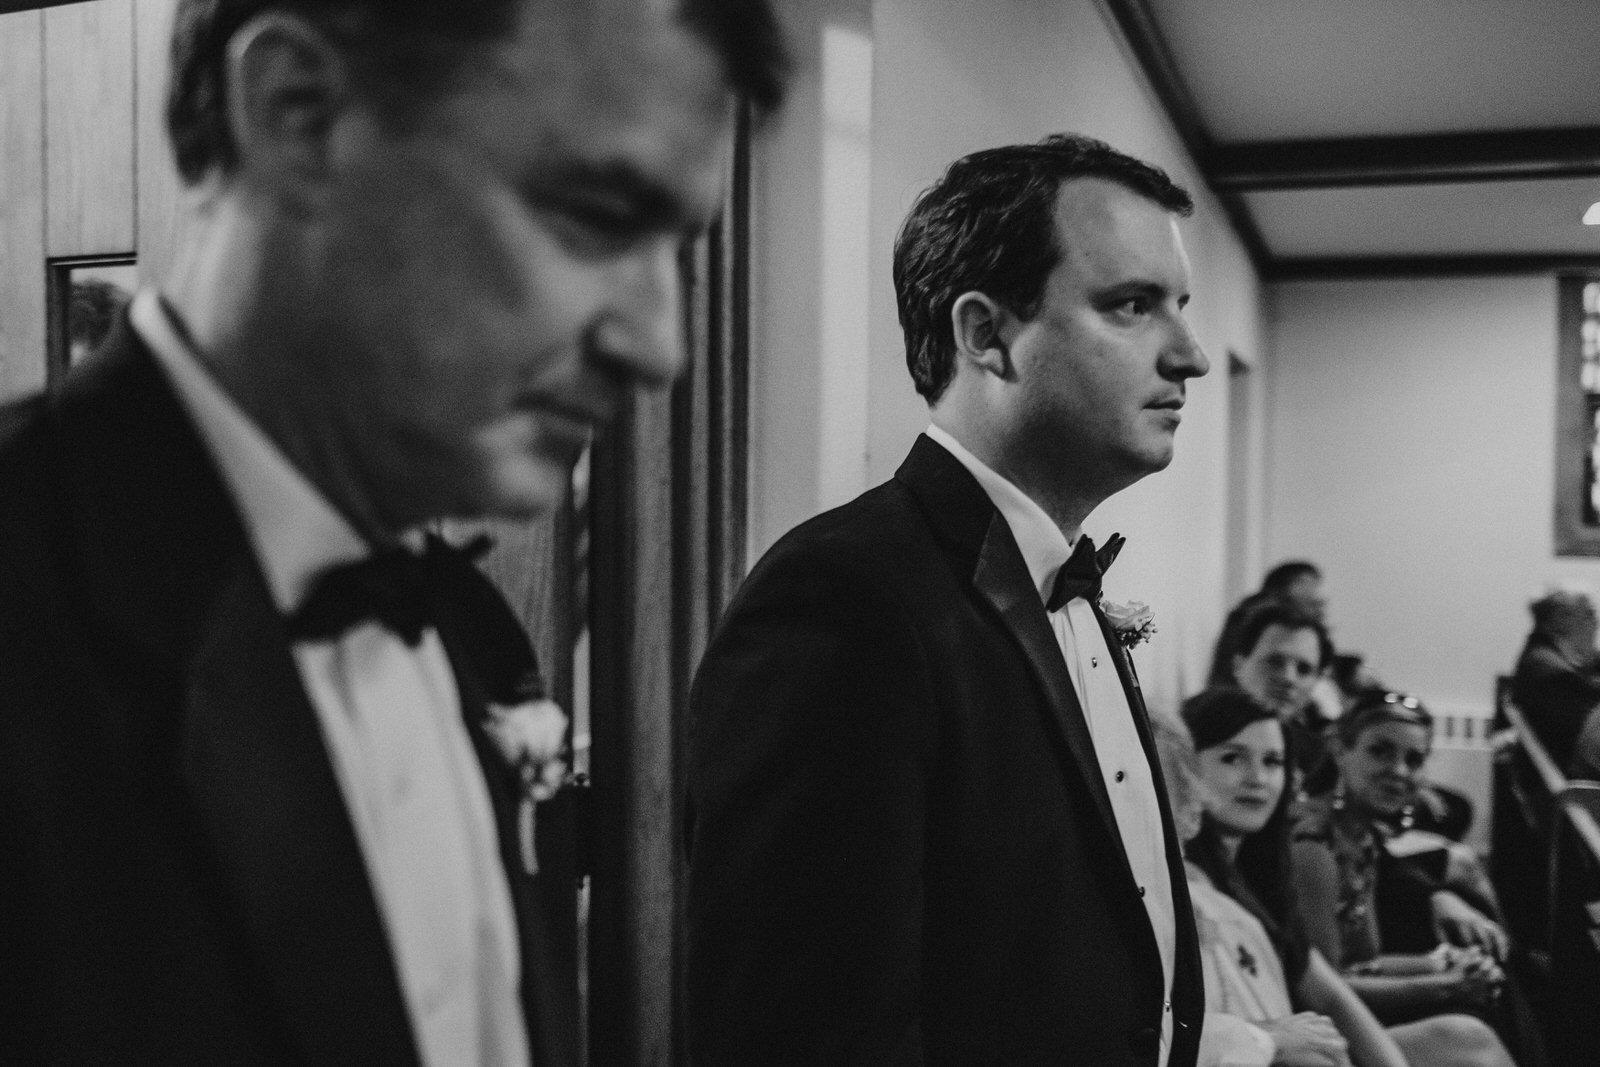 Oxford_Mississippi_wedding_photographer_29.JPG